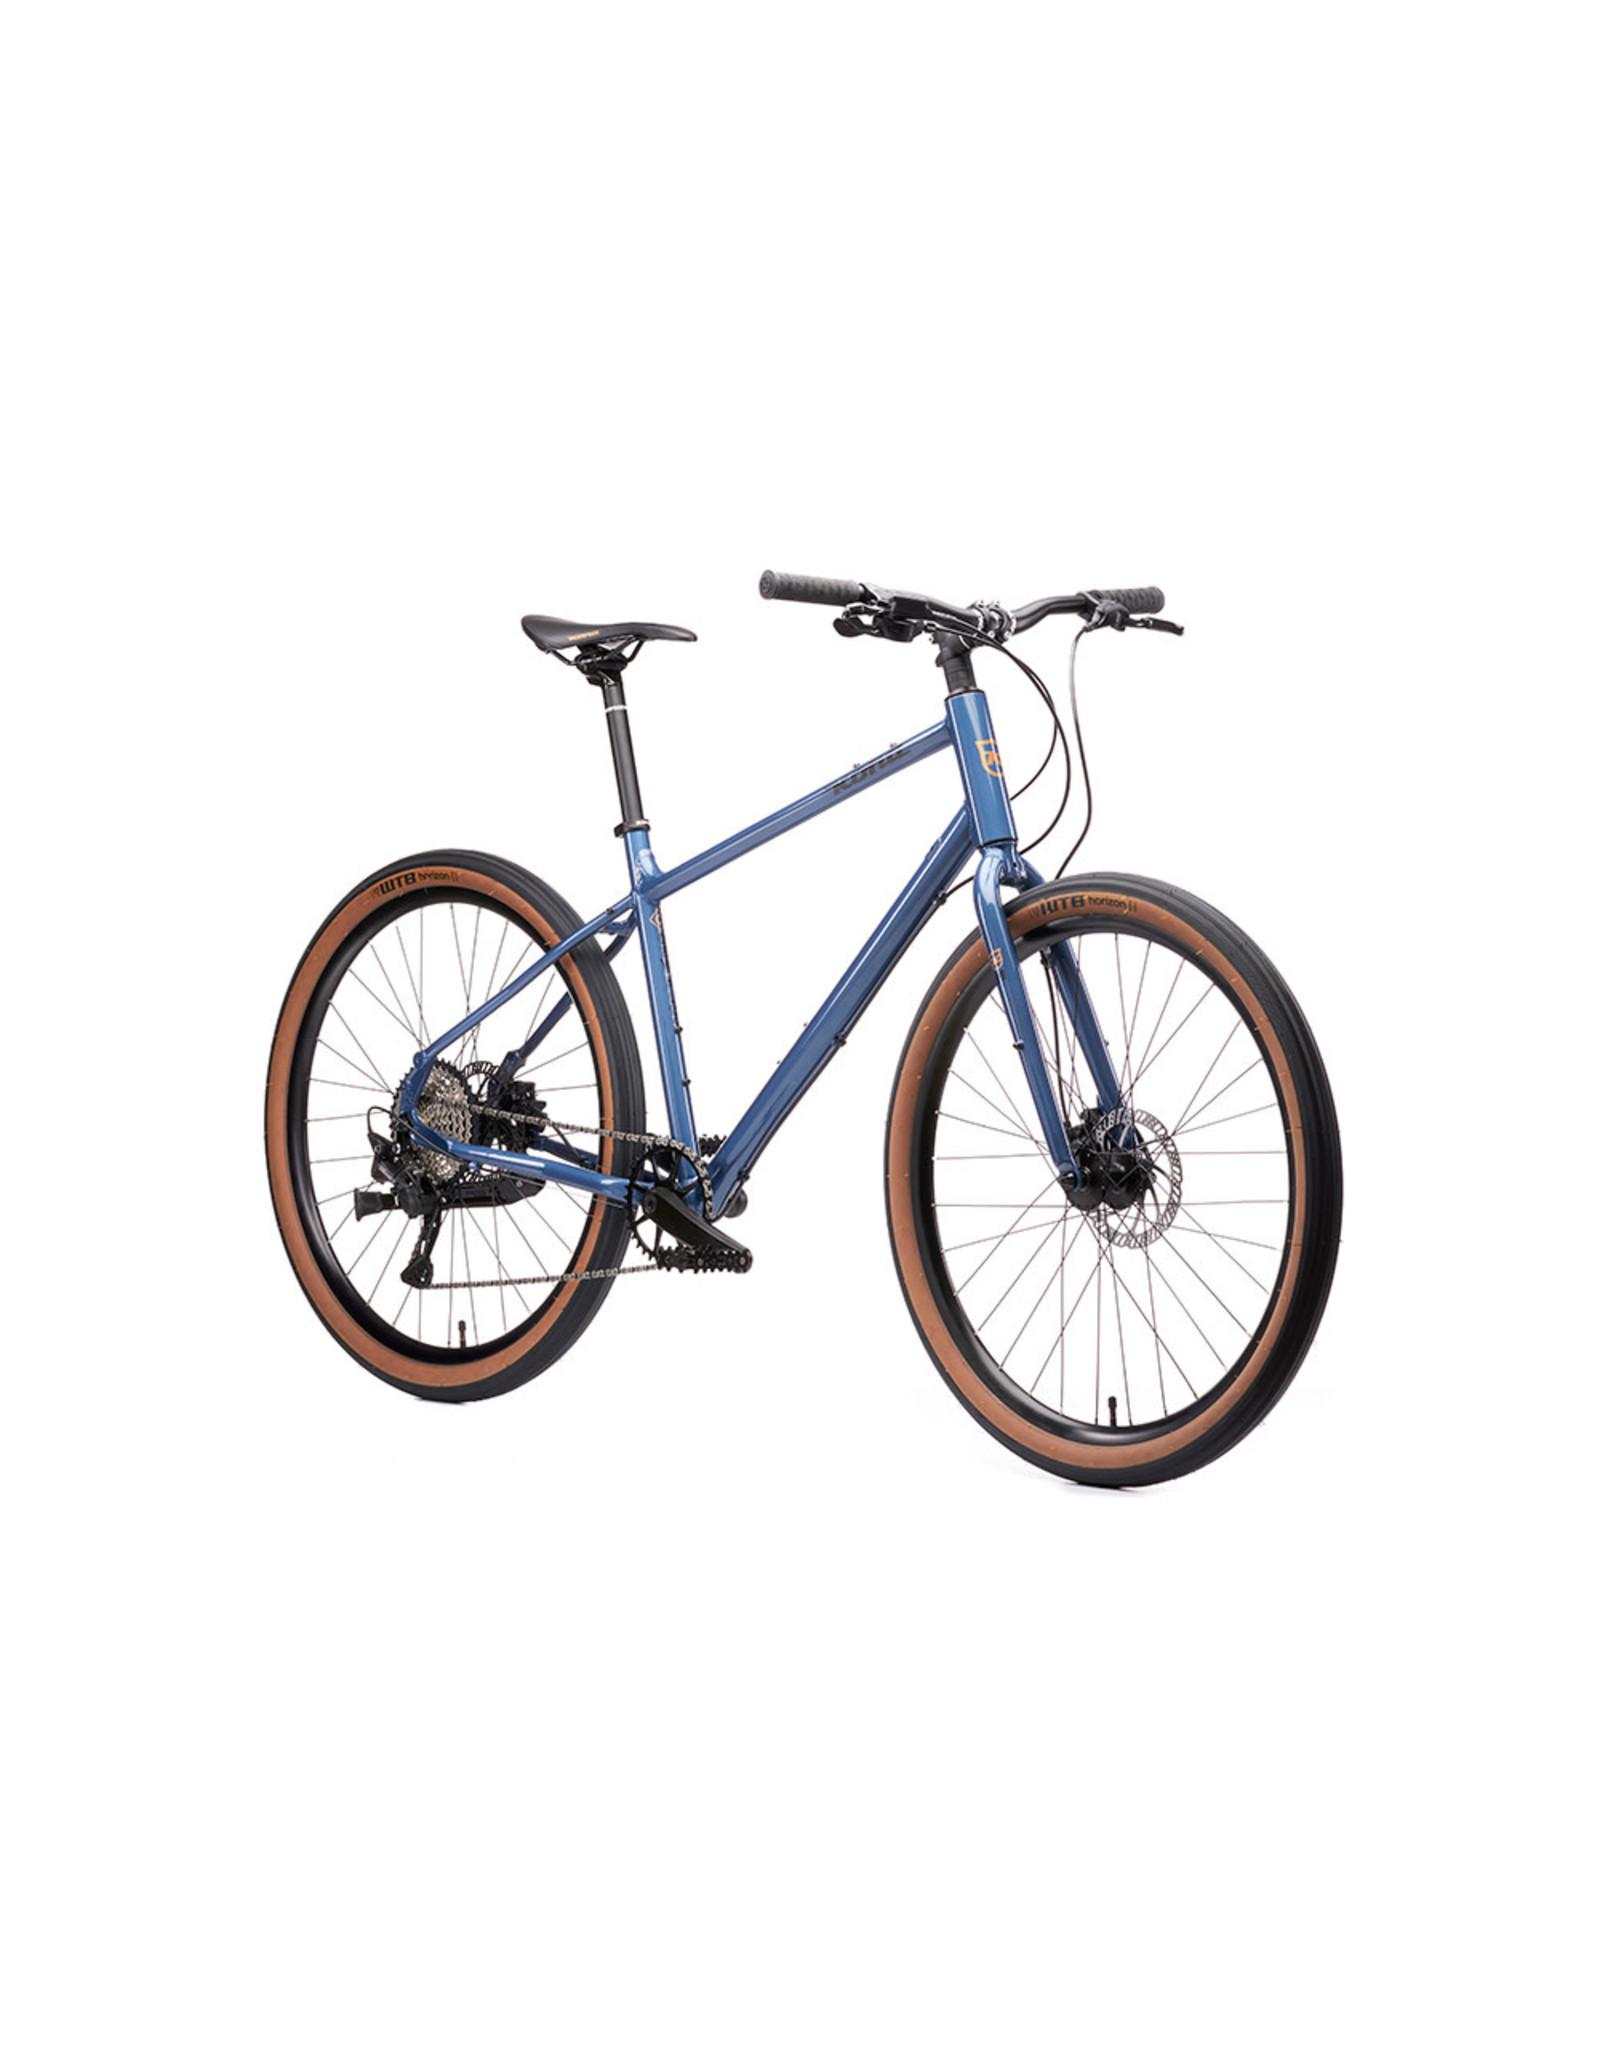 Kona Kona Dew Plus (L) 2021 Blue